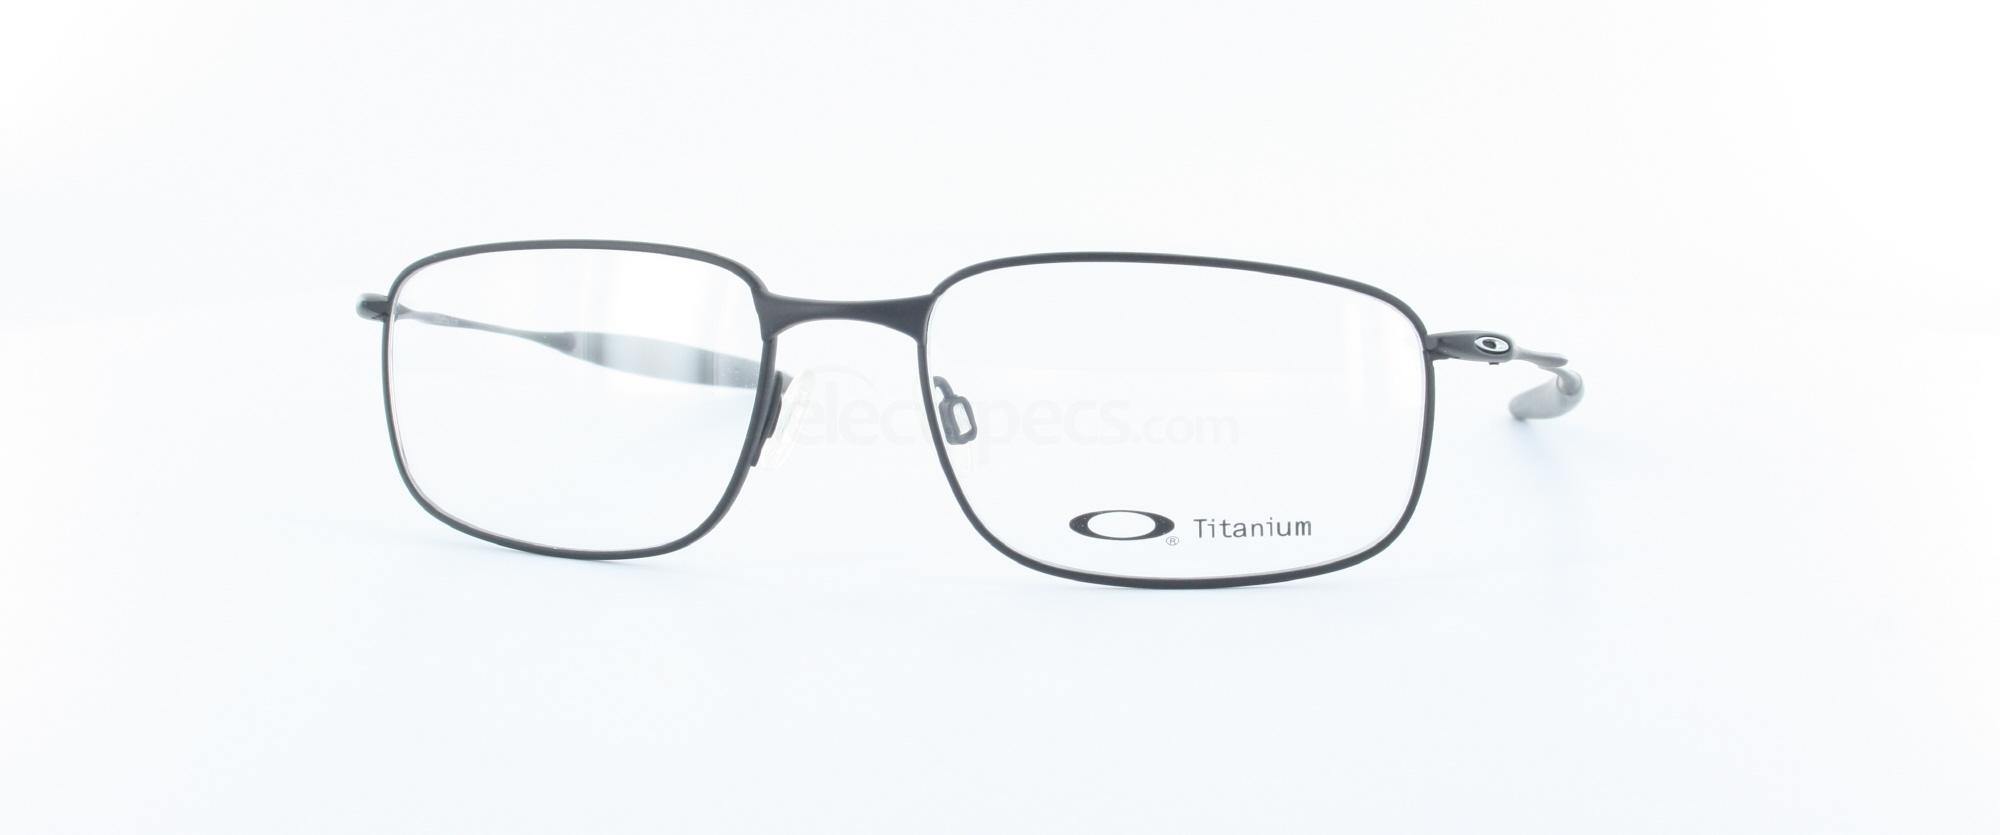 5ffc827012 Oakley Chieftain Sunglasses